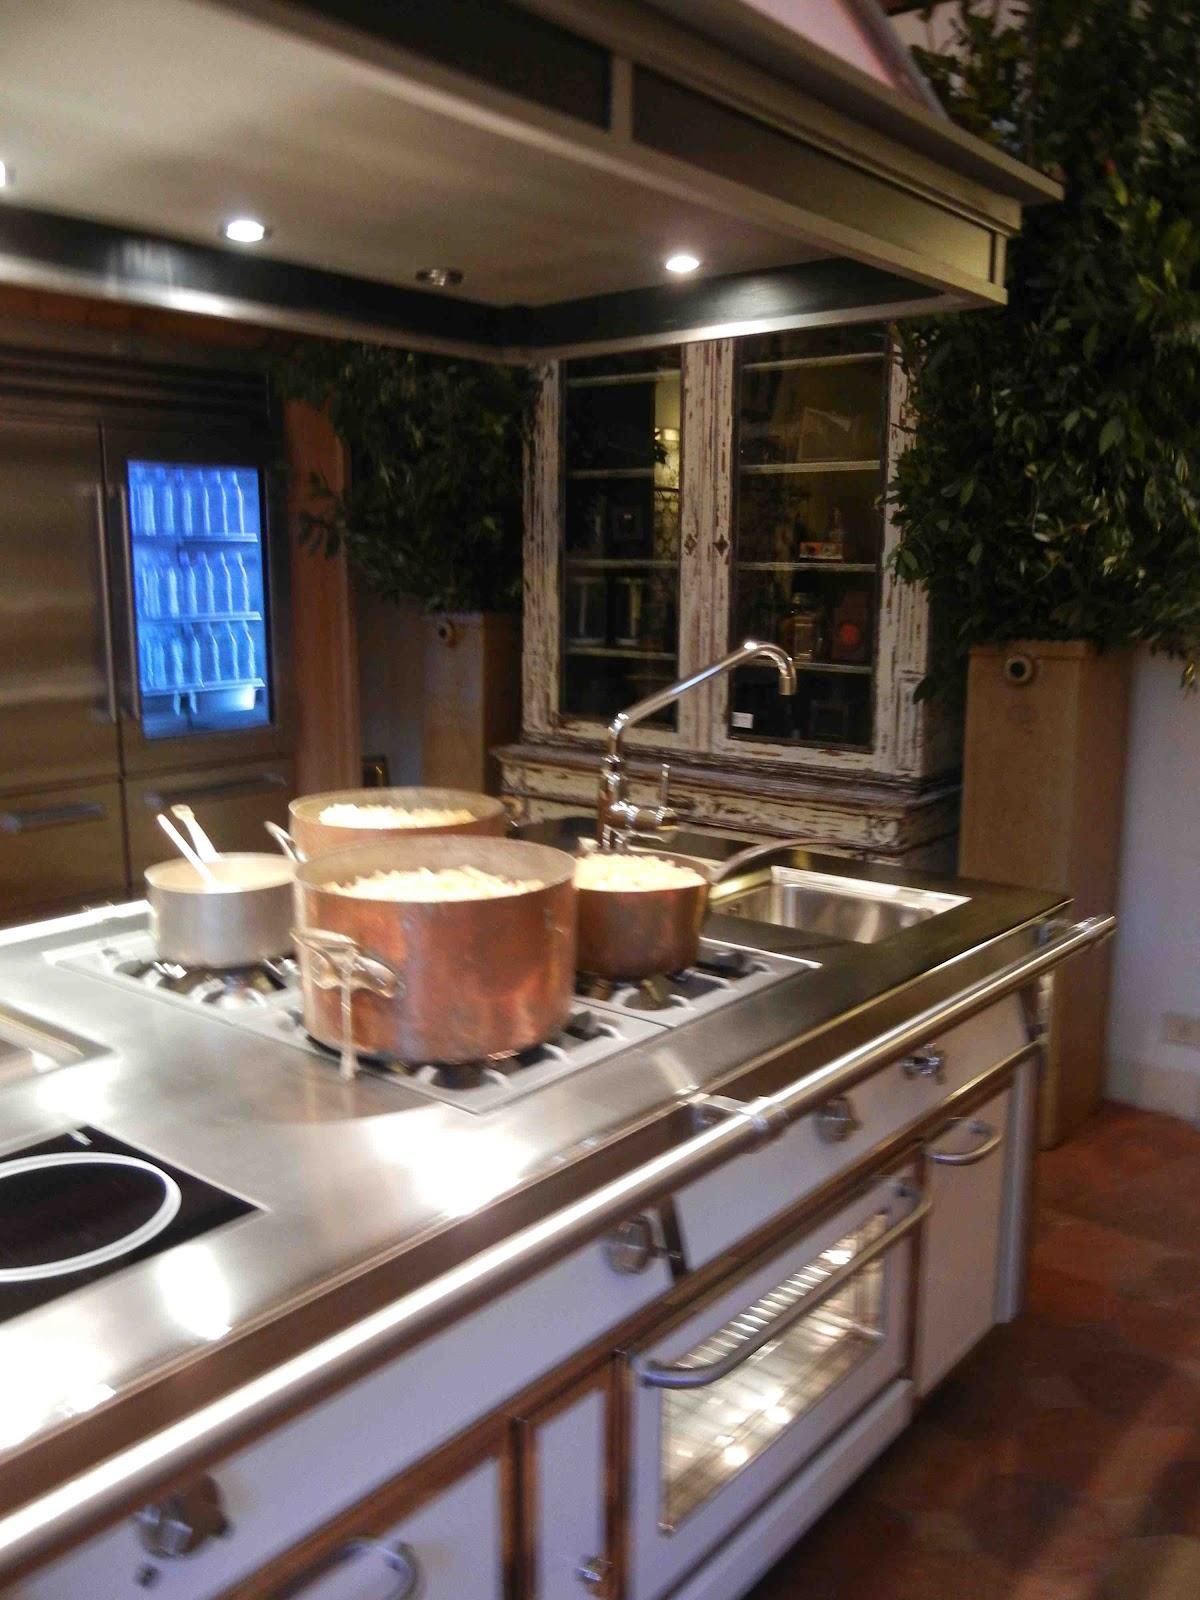 Negozi cucine firenze idee di design per la casa for Arredamento firenze